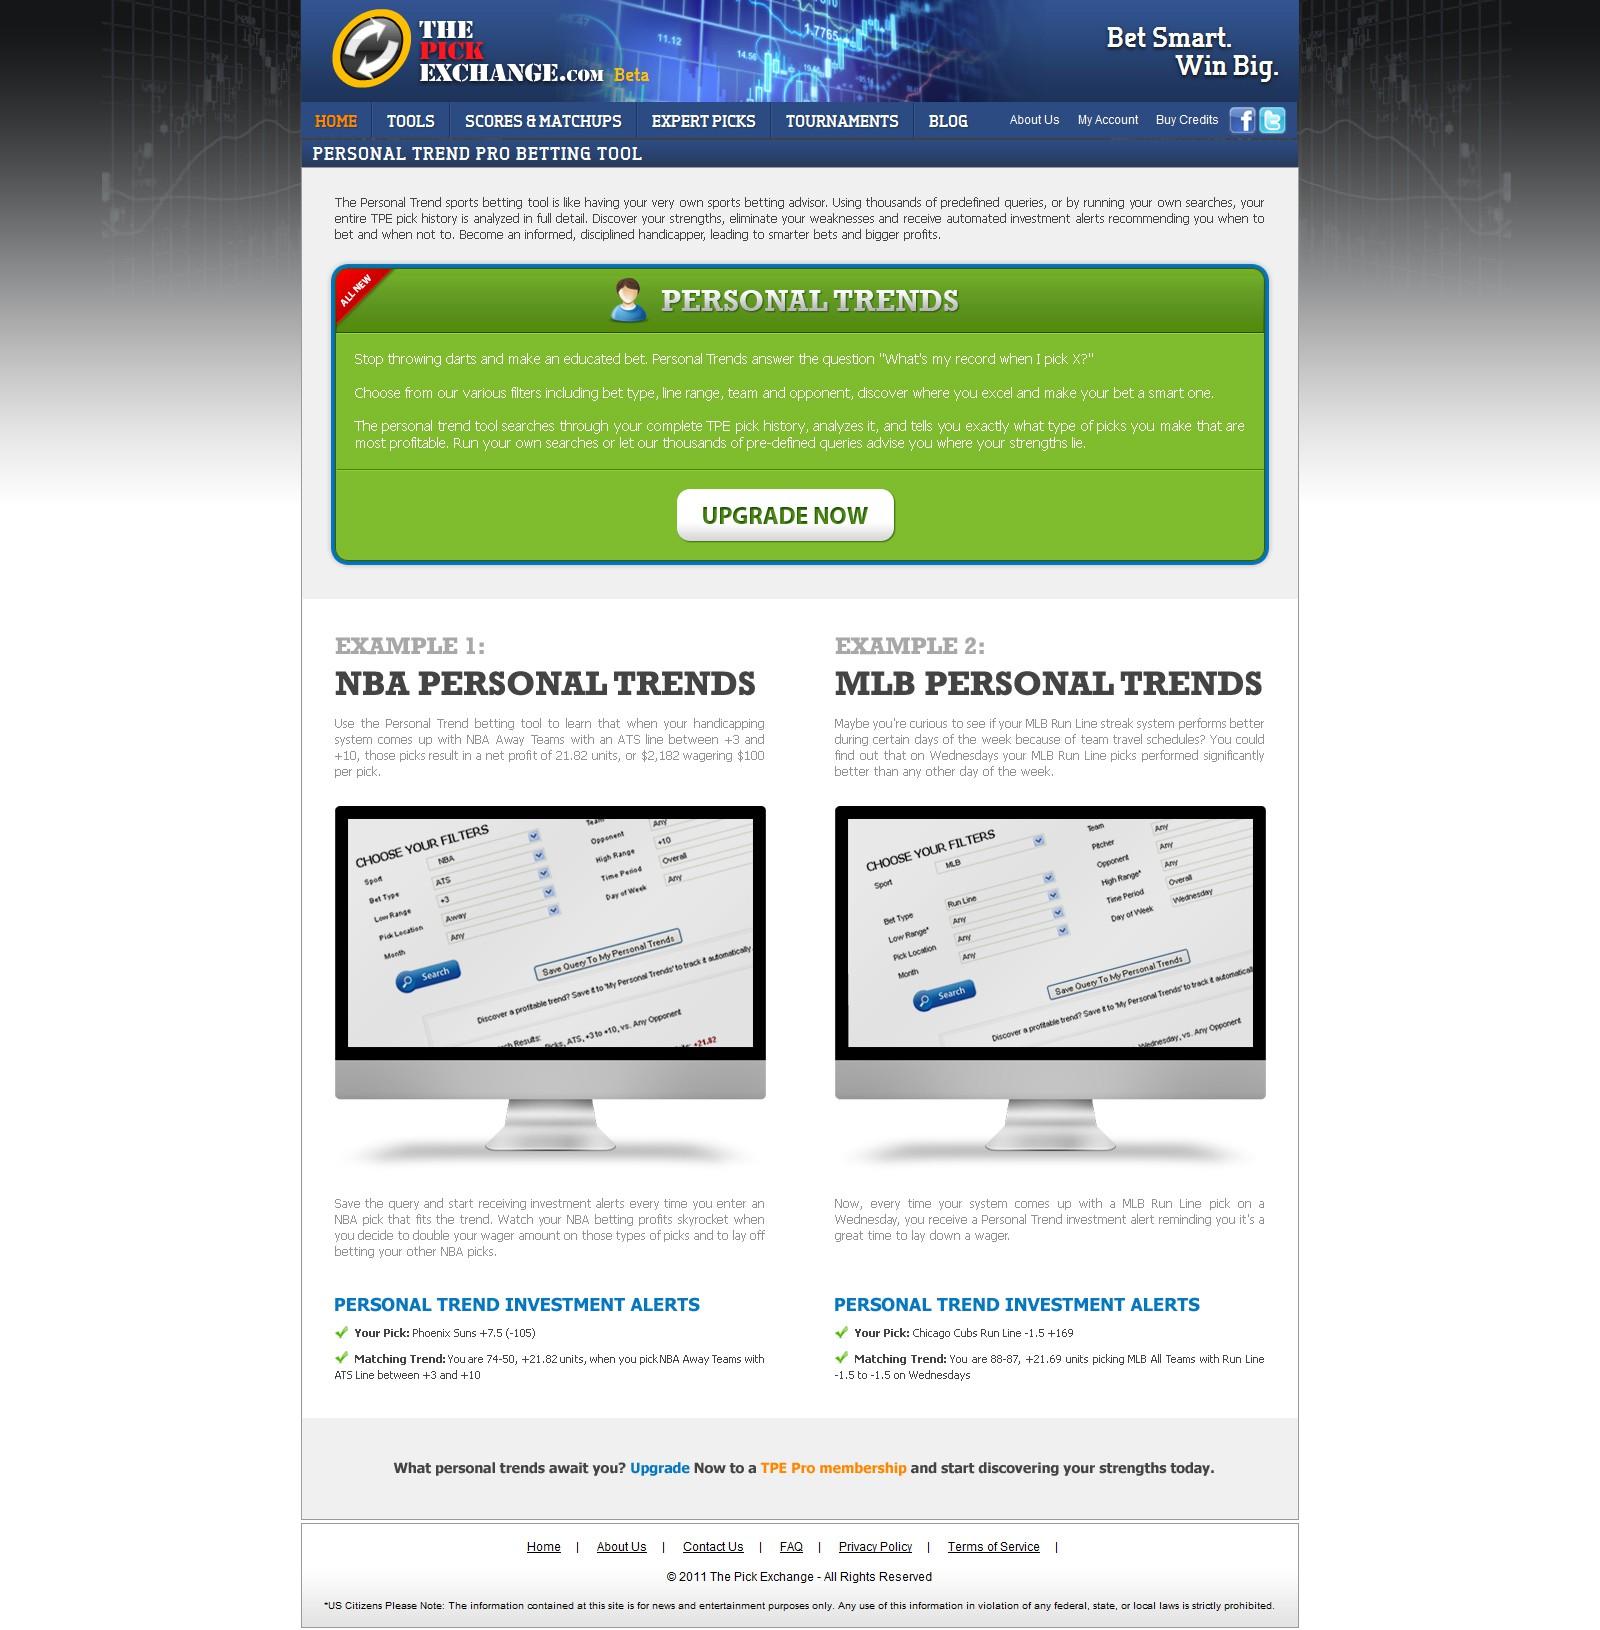 Sports website needs fresh page design